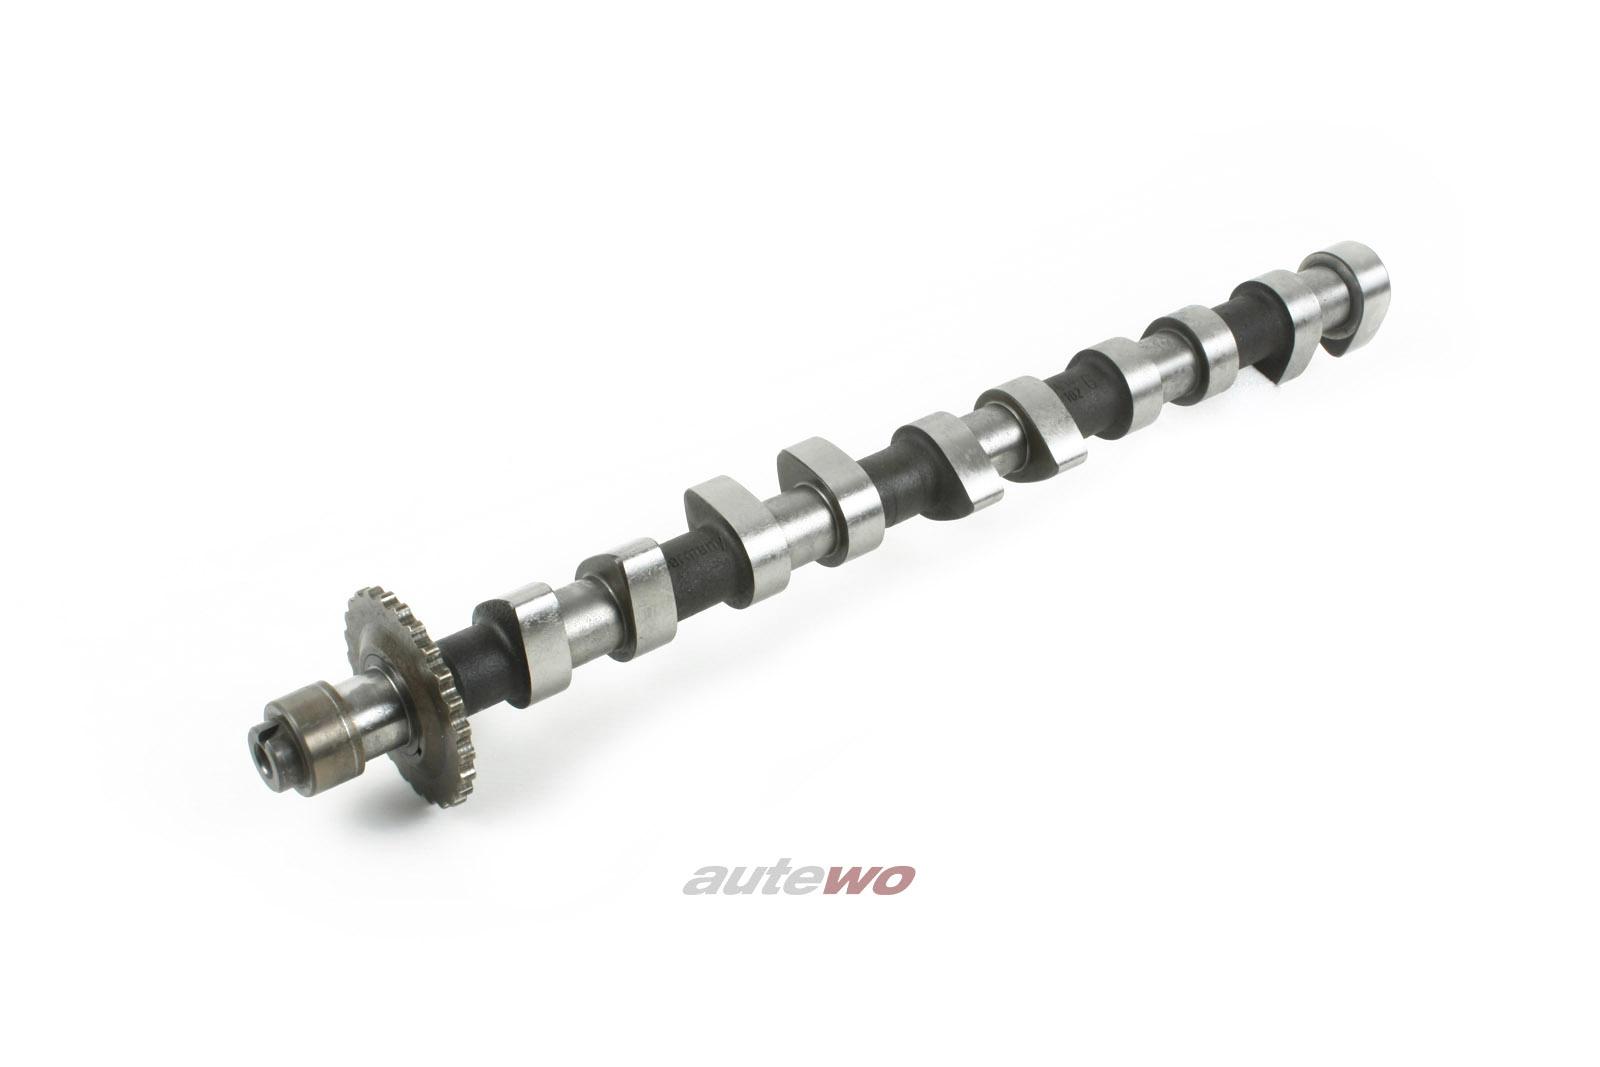 034109022G NEU Audi RS2 2.2l 315PS 20V Turbo ADU Auslass-Nockenwelle Tuning